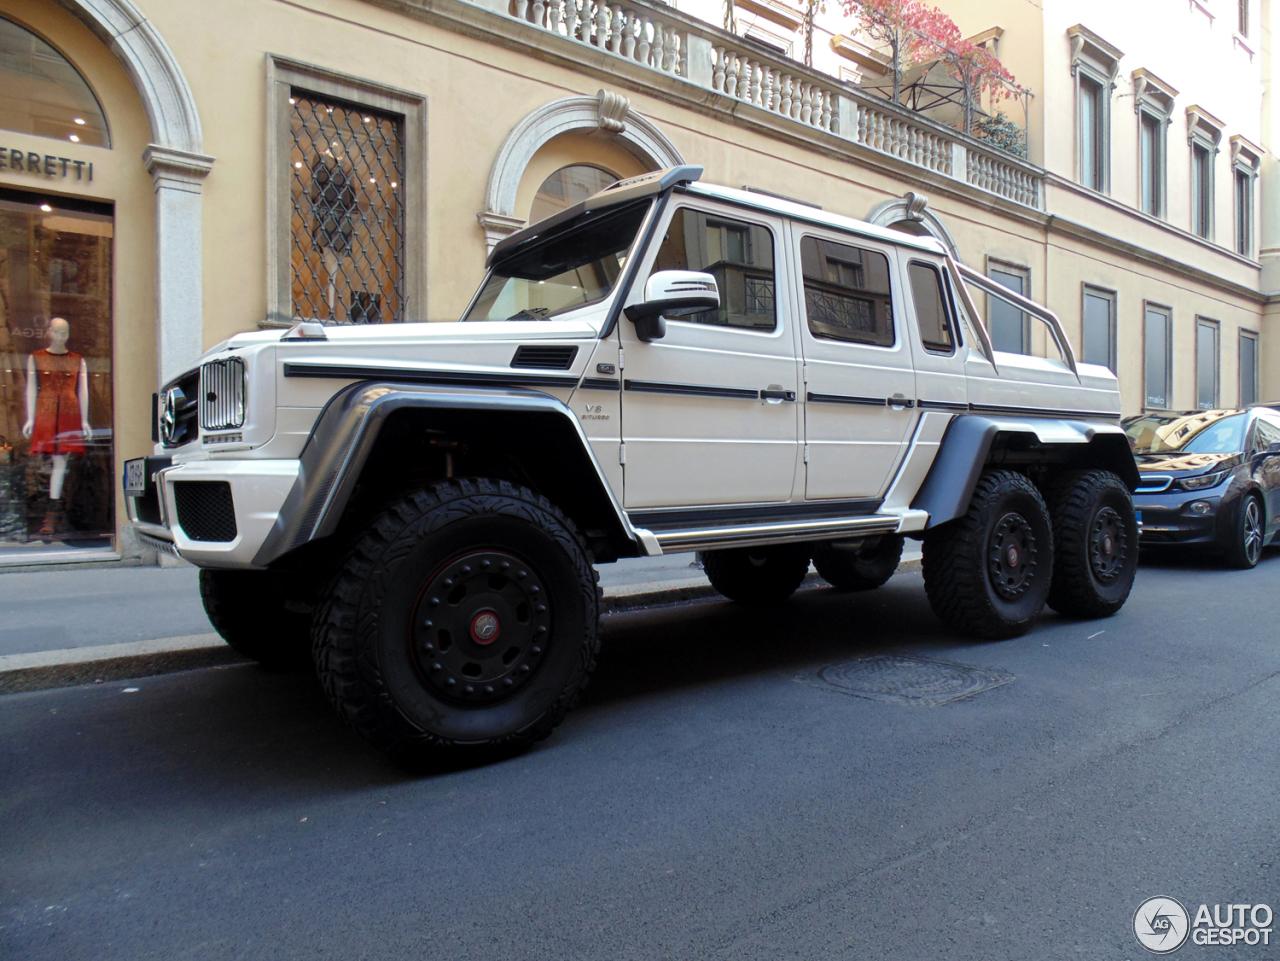 Mercedes benz g 63 amg 6x6 18 october 2014 autogespot for Mercedes benz amg 6x6 price